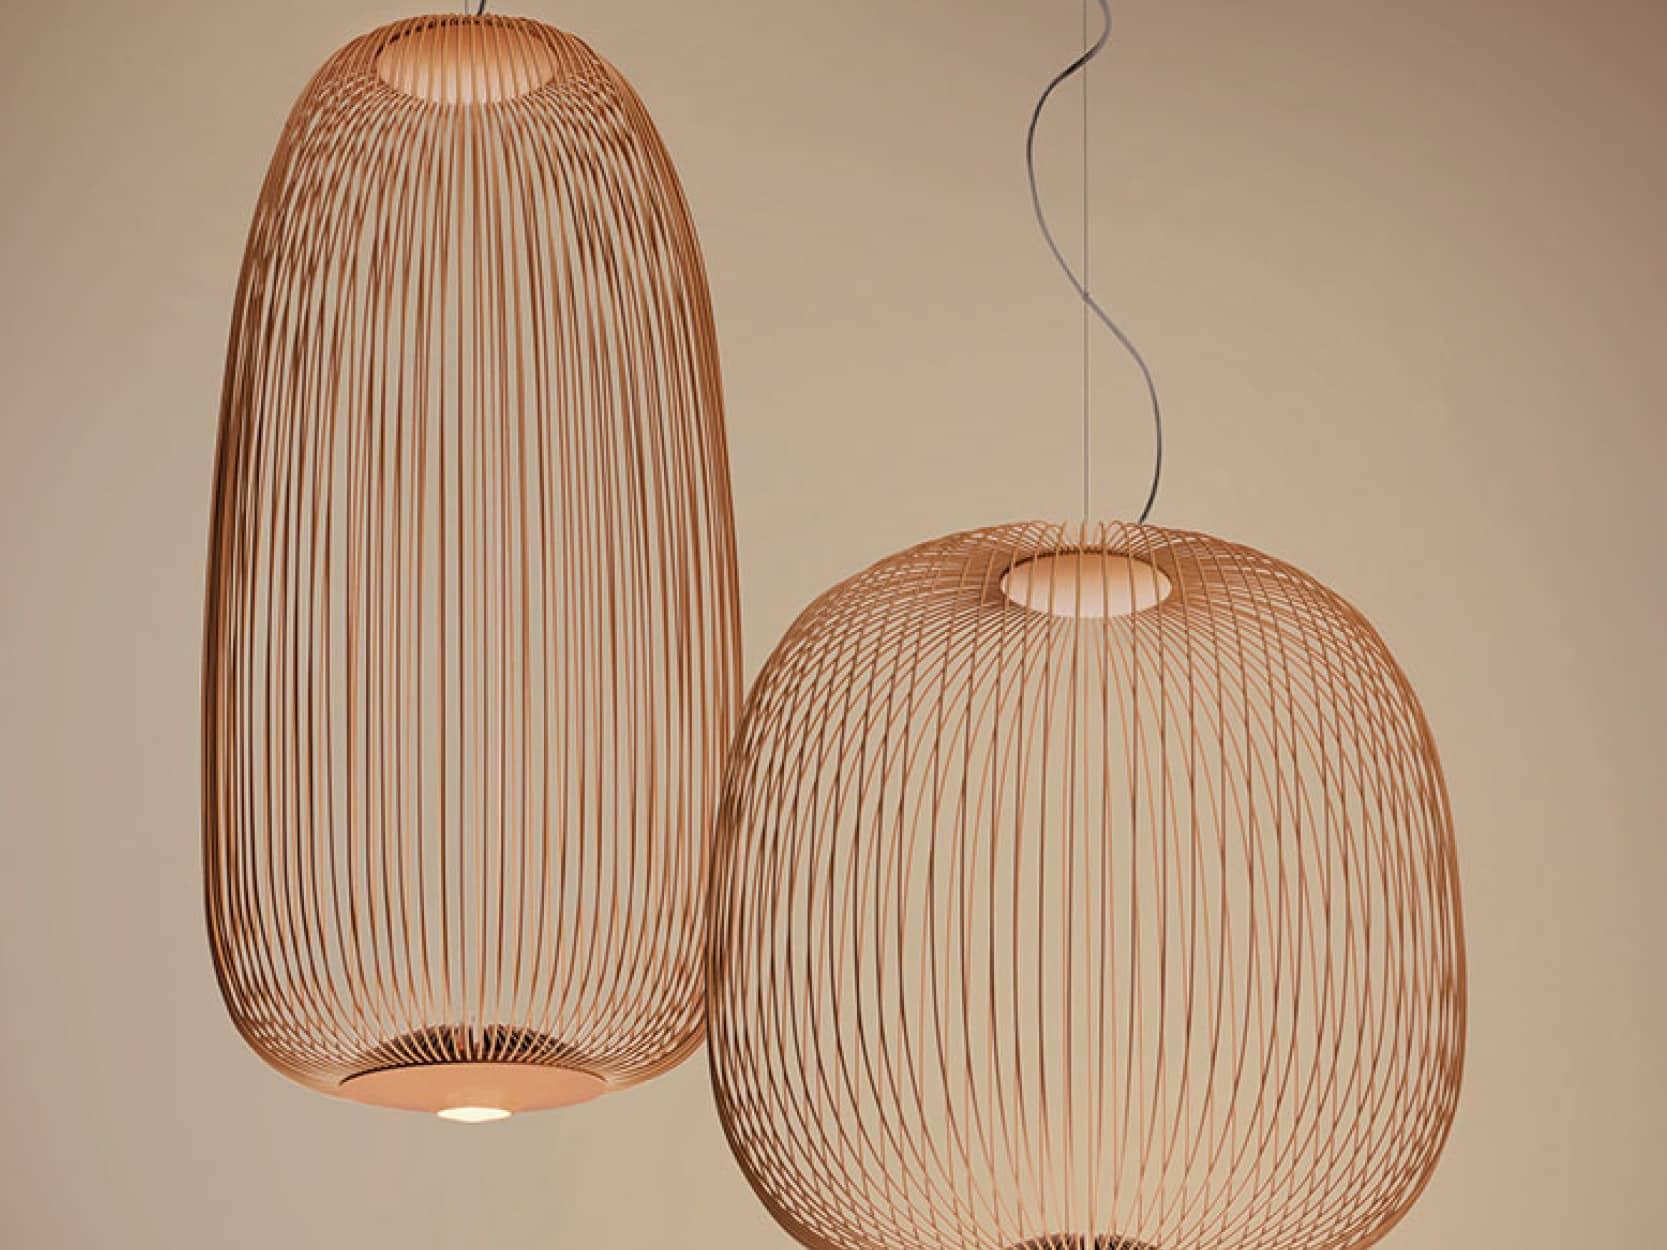 Foscarini hanglamp Spokes2 koper